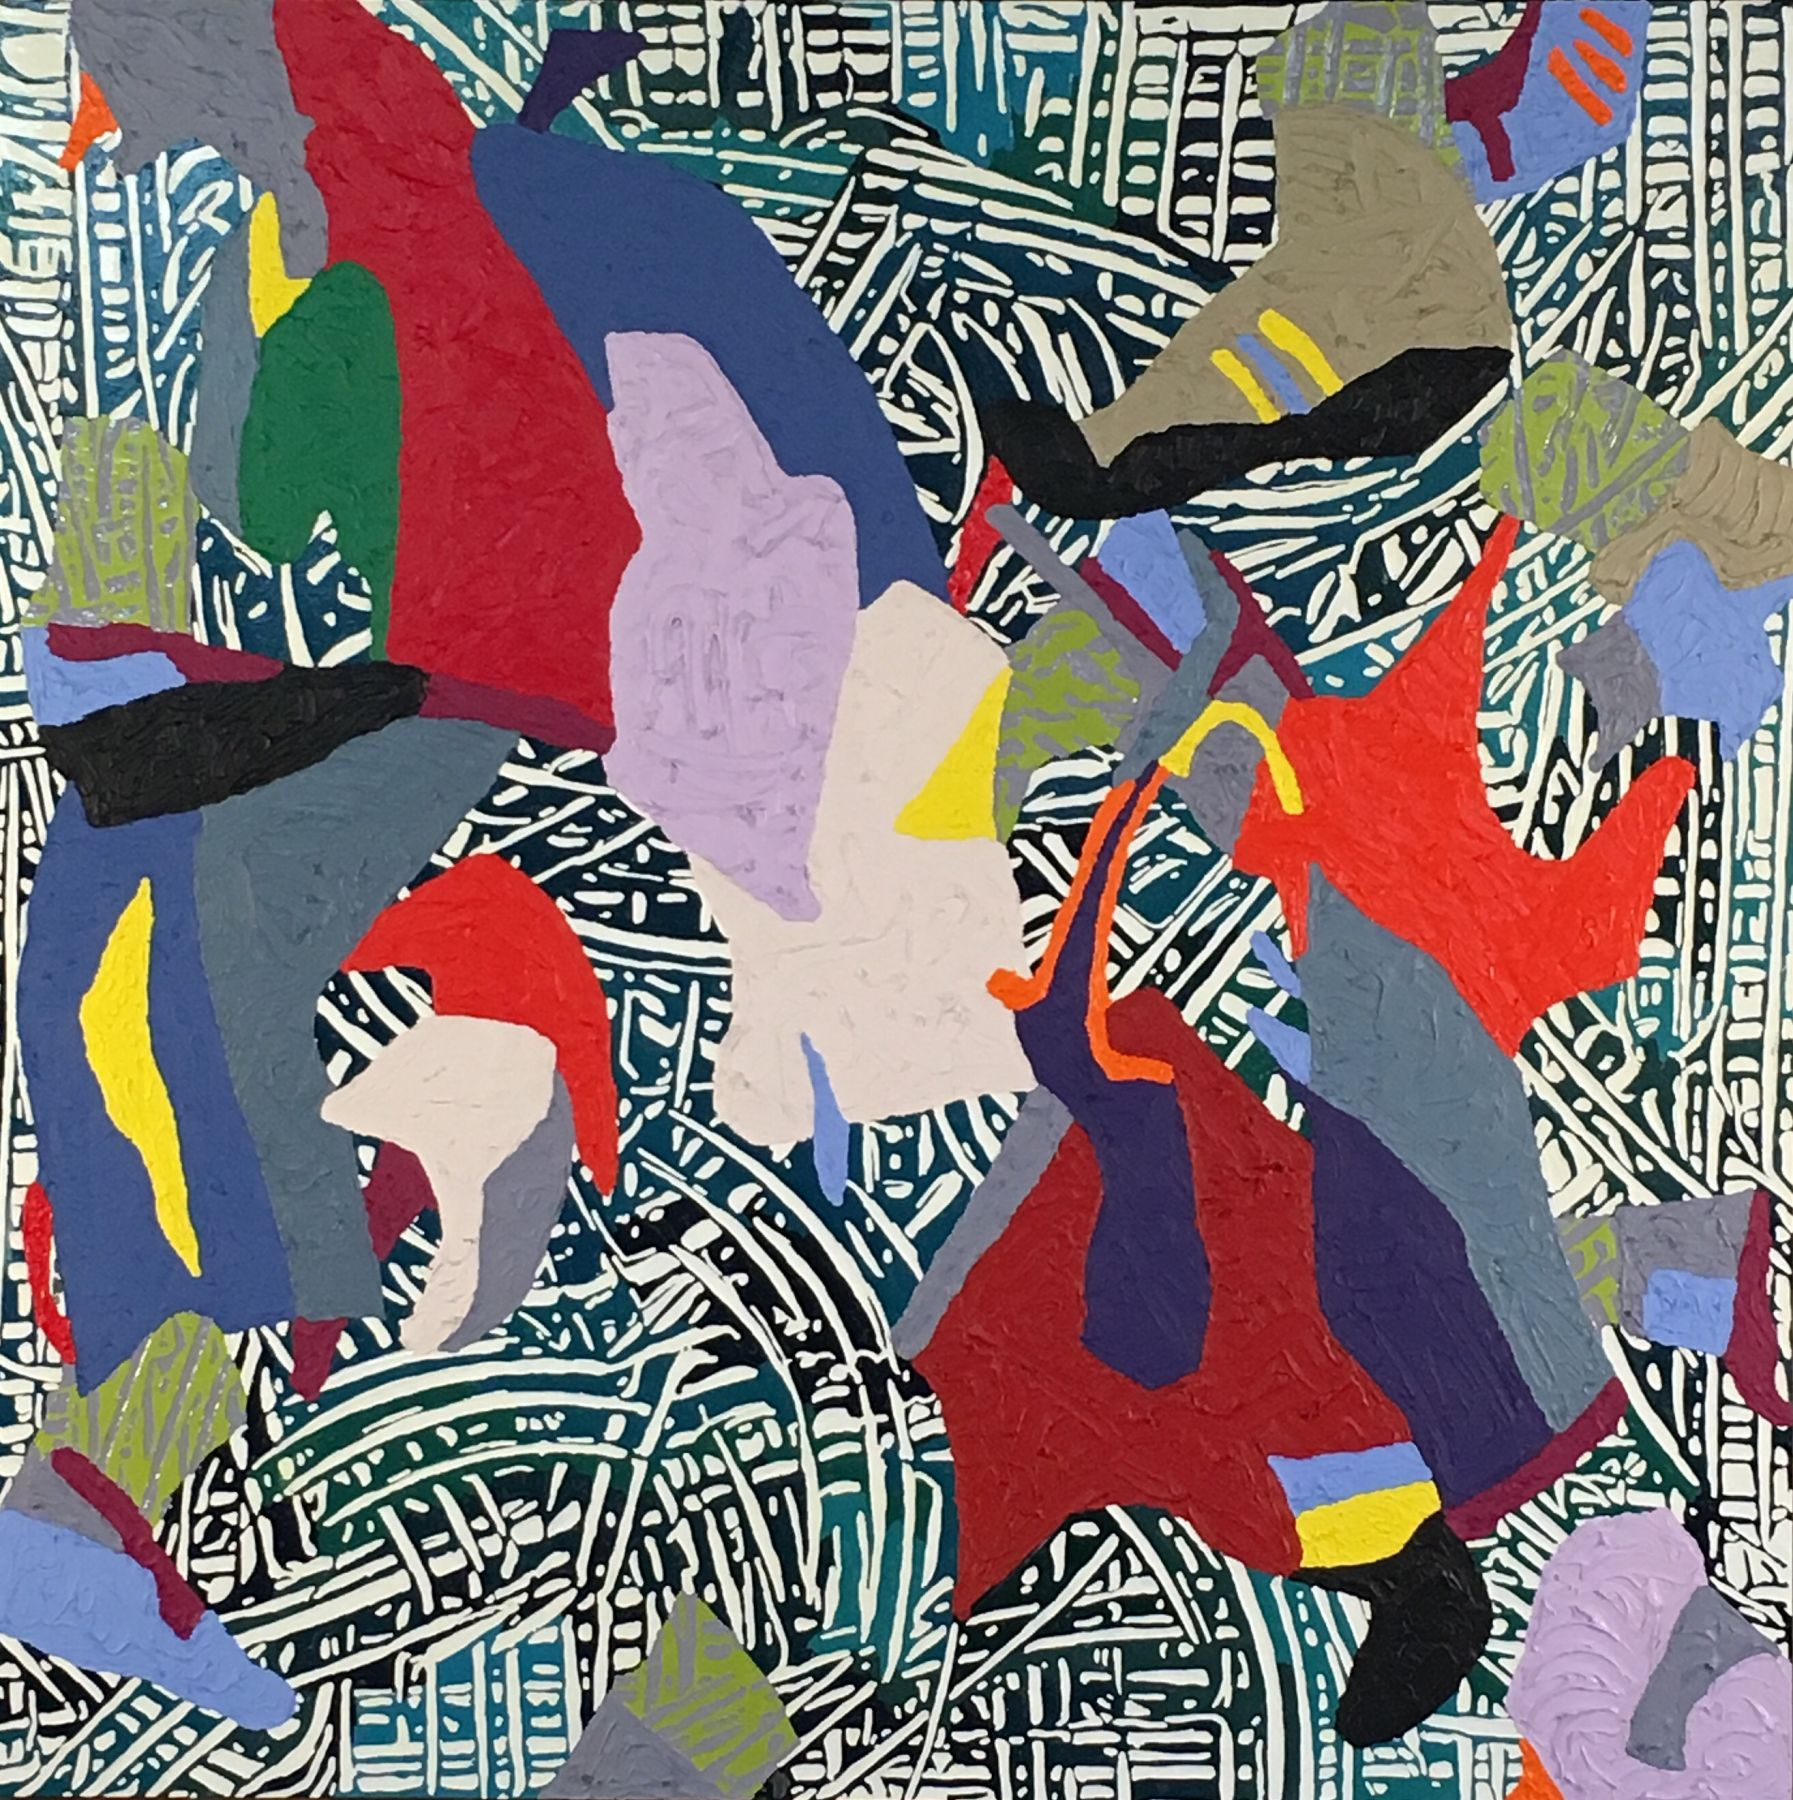 "Alex Herzog, Single-hip toss,oil on LDF panel, 45"" x 45"", 2016"